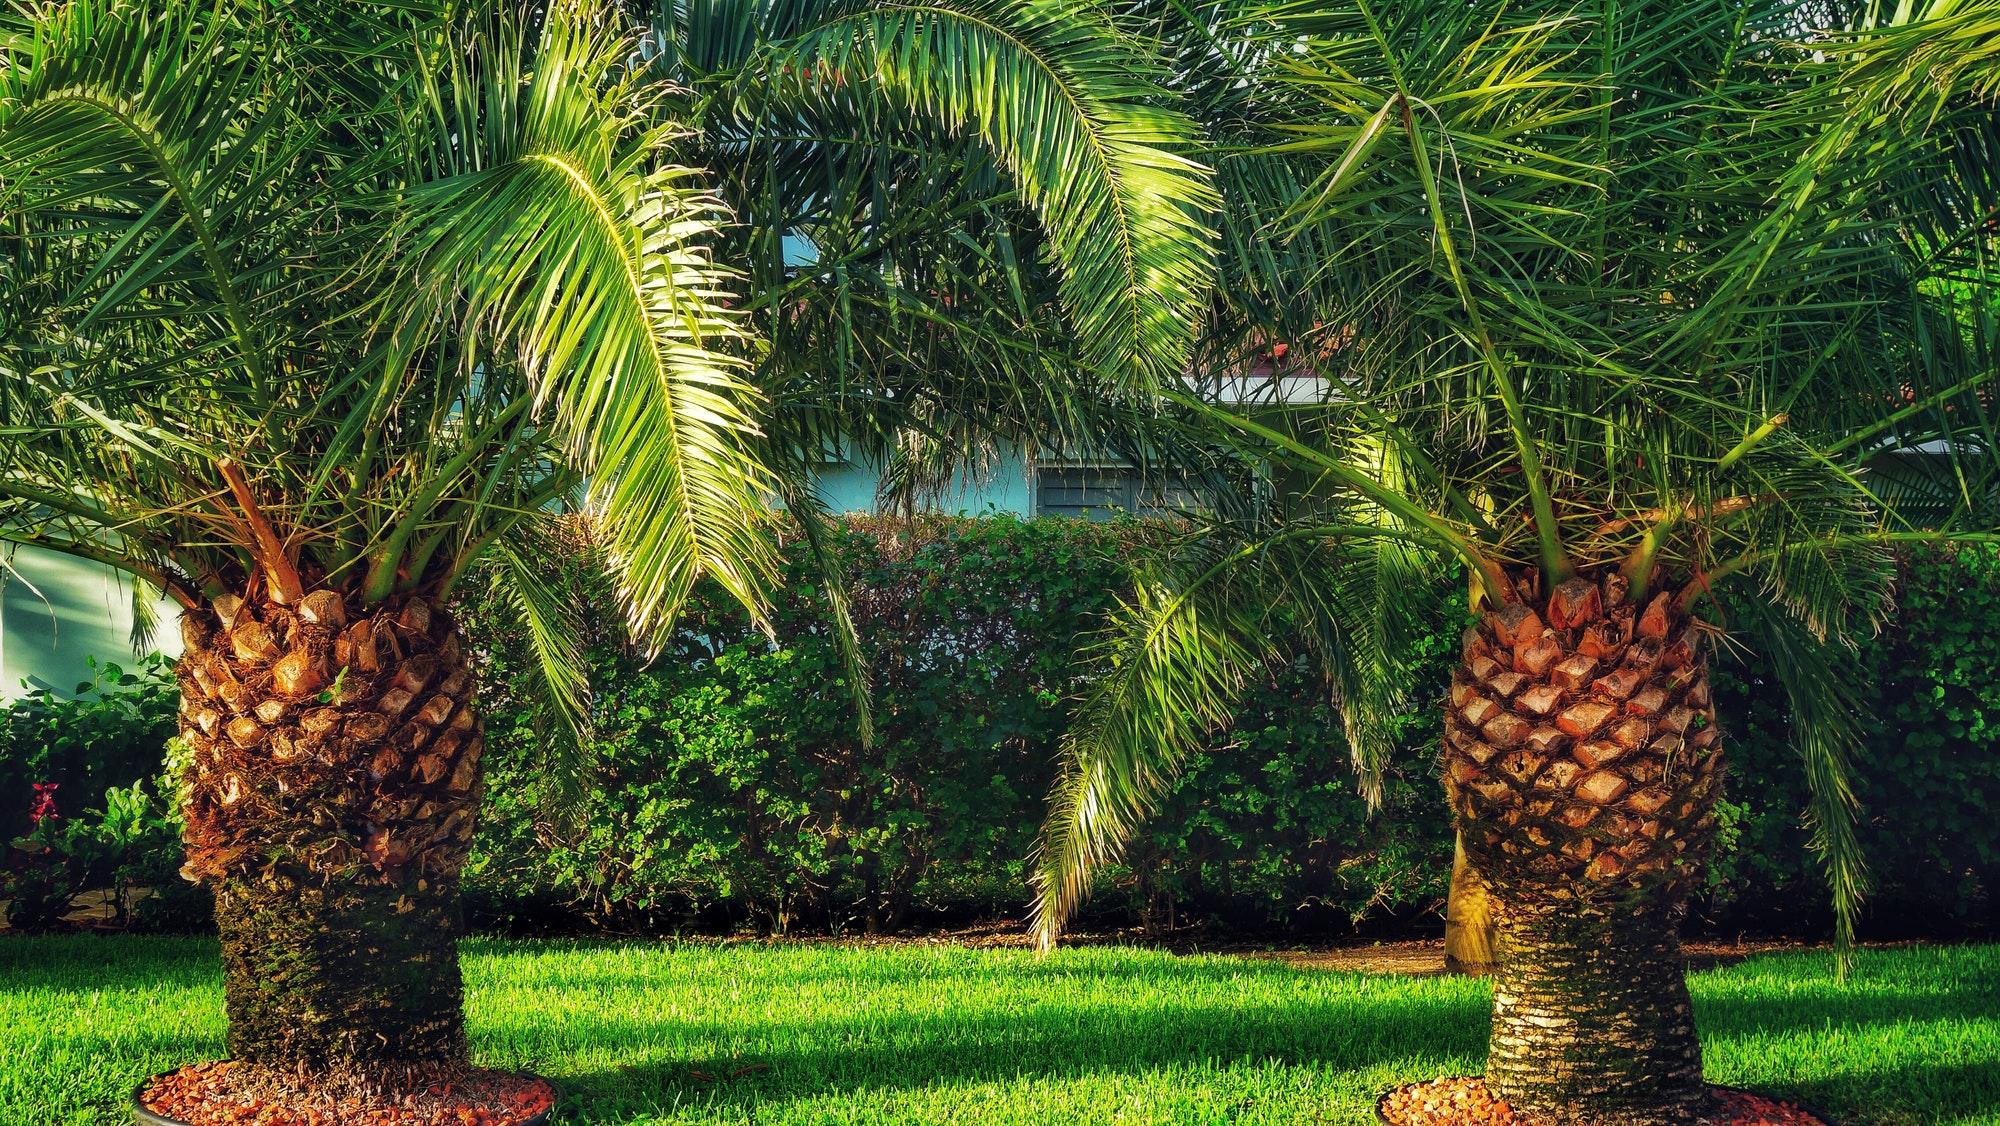 Miniature Date Palms Decorating A Florida Lawn